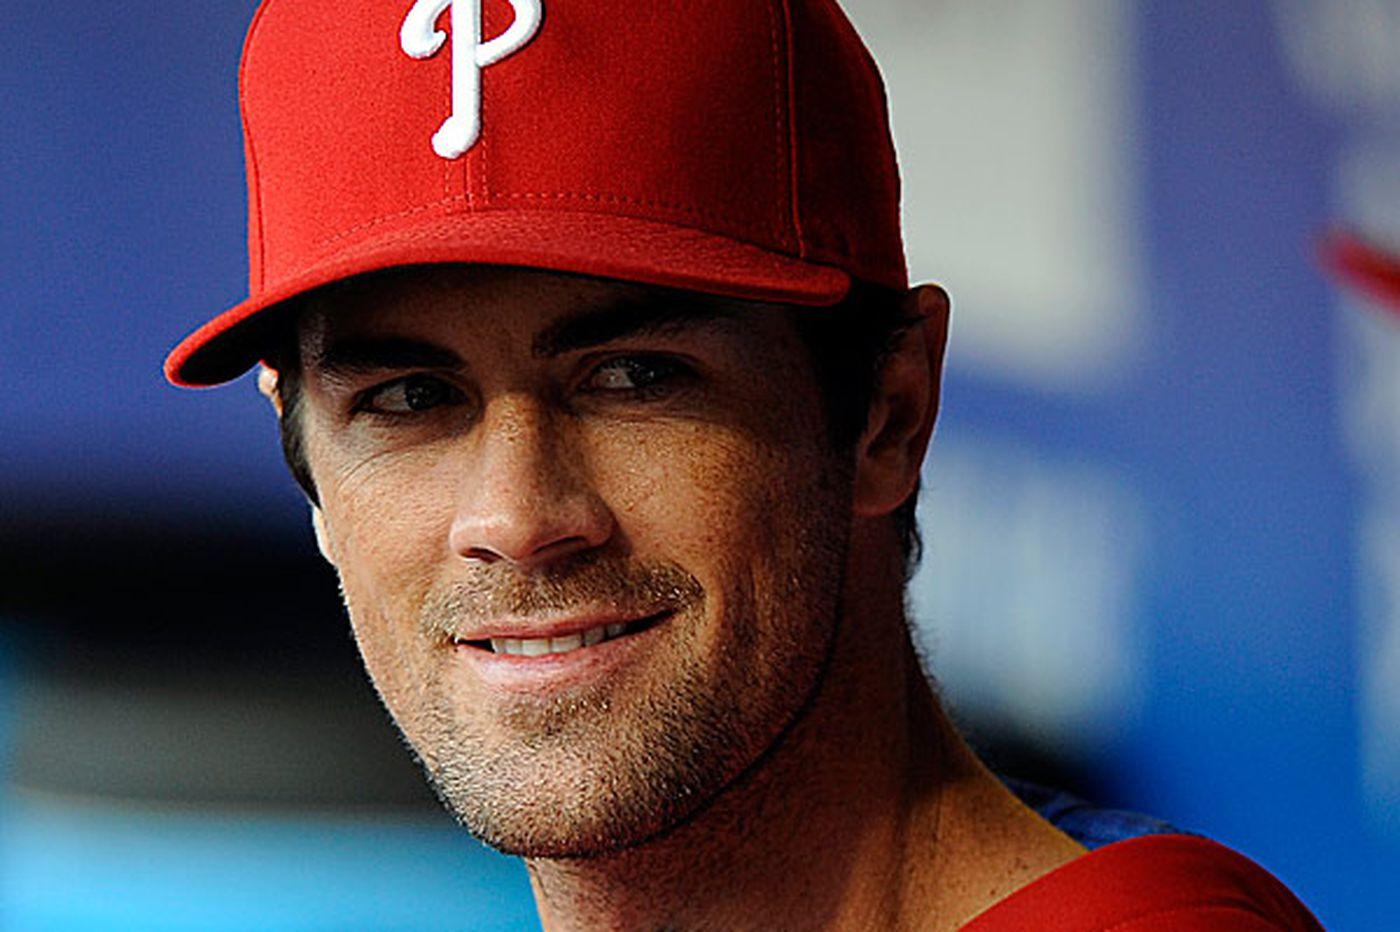 Phillies' Cole Hamels set to make return Wednesday against Dodgers